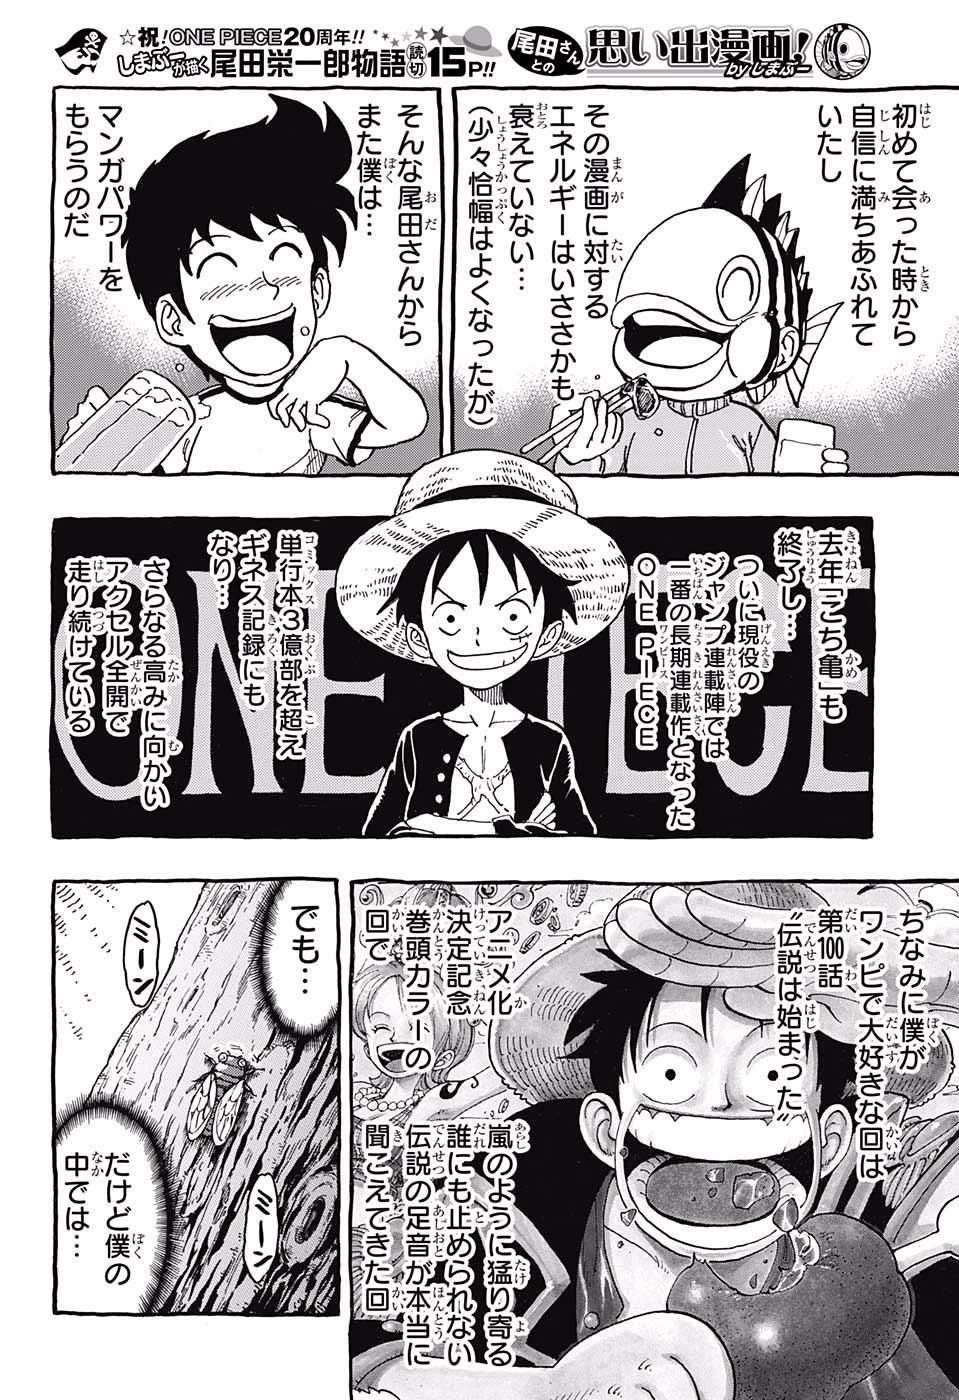 One Piece Manga 2017 IDMPWNB6